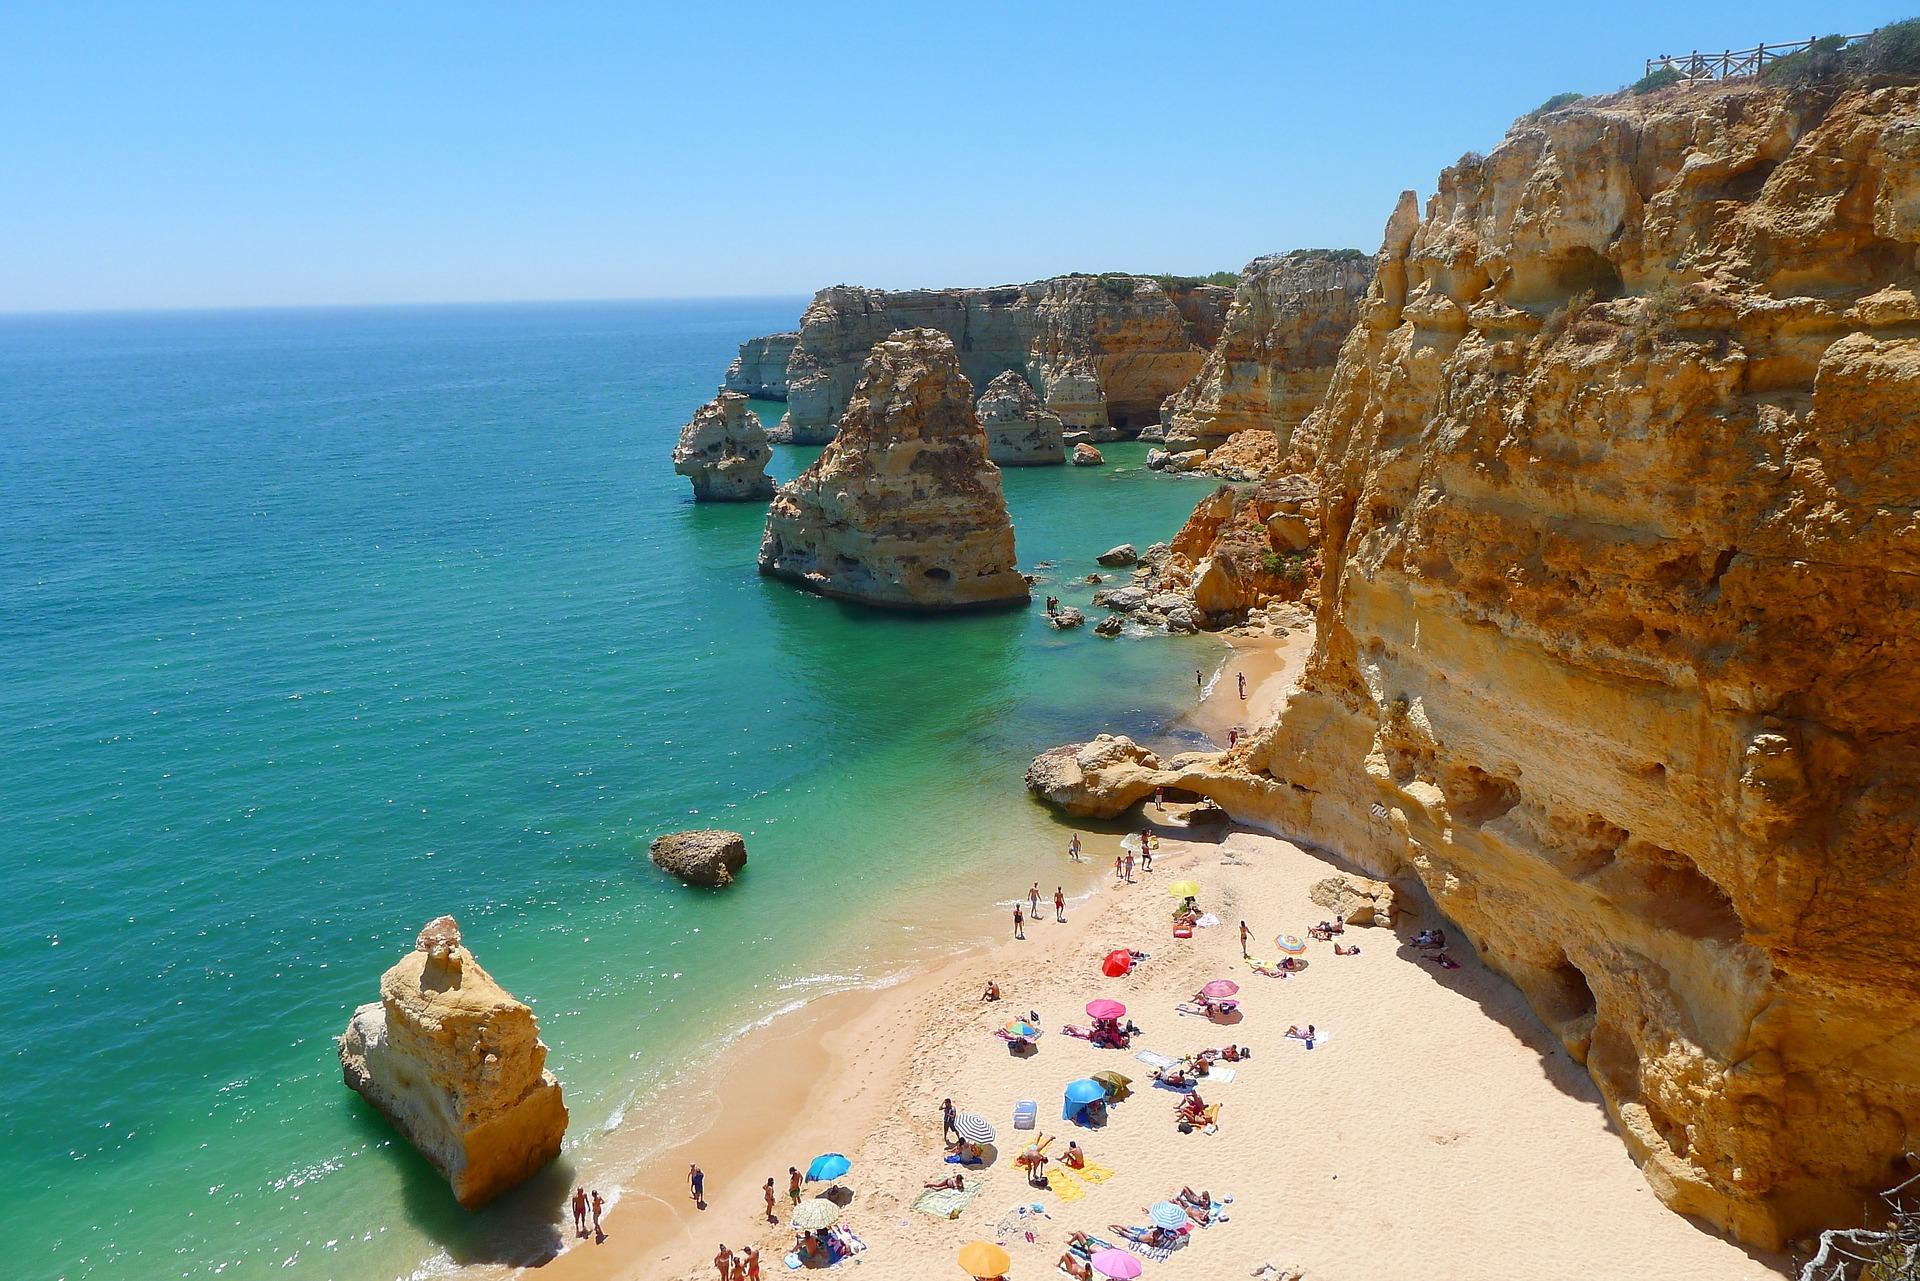 Hotel in Praia de Falesia Portugal ab 8,00€ günstig die Nacht